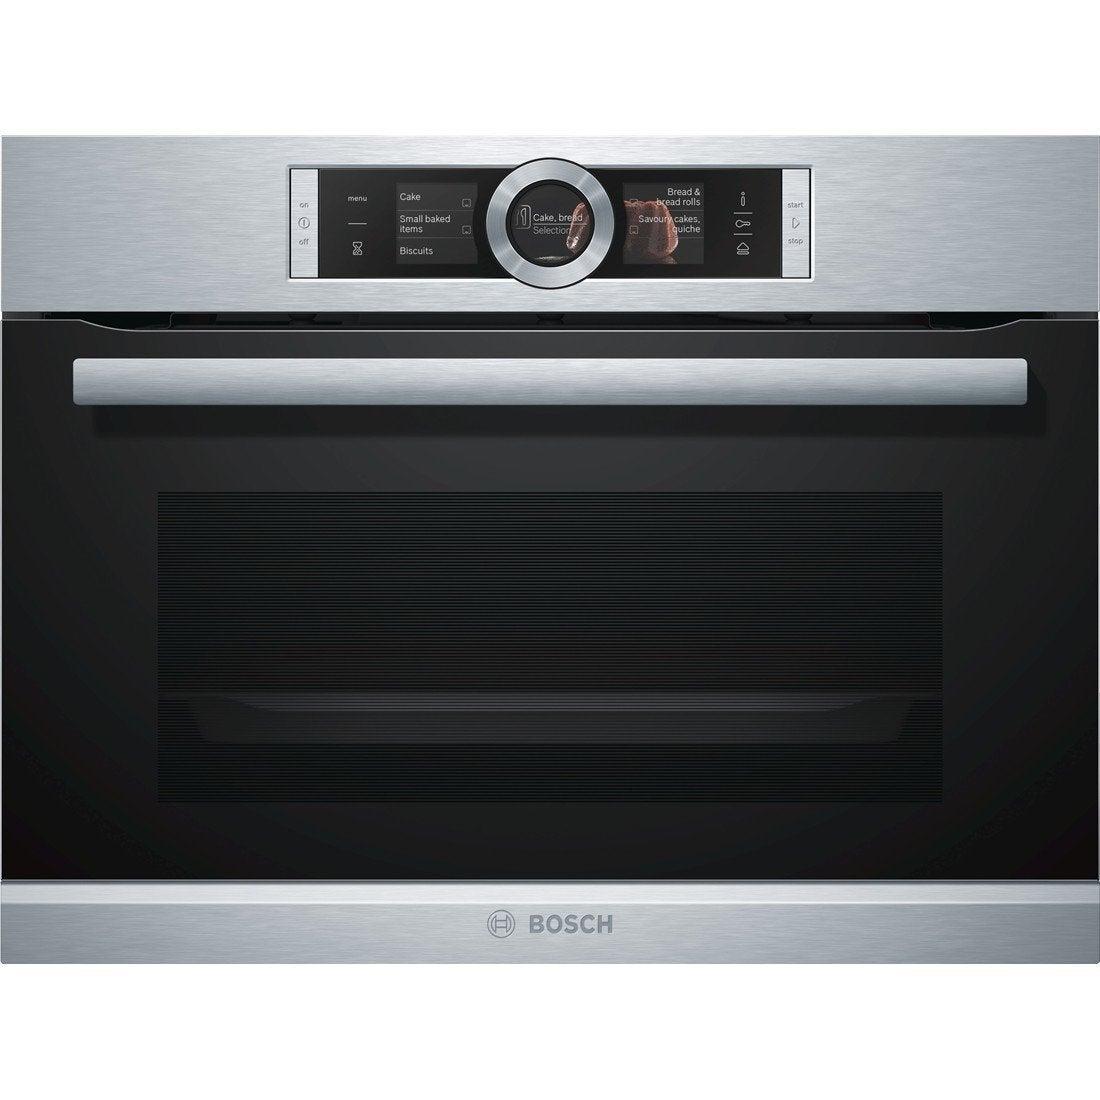 Bosch CSG636BS2 Oven